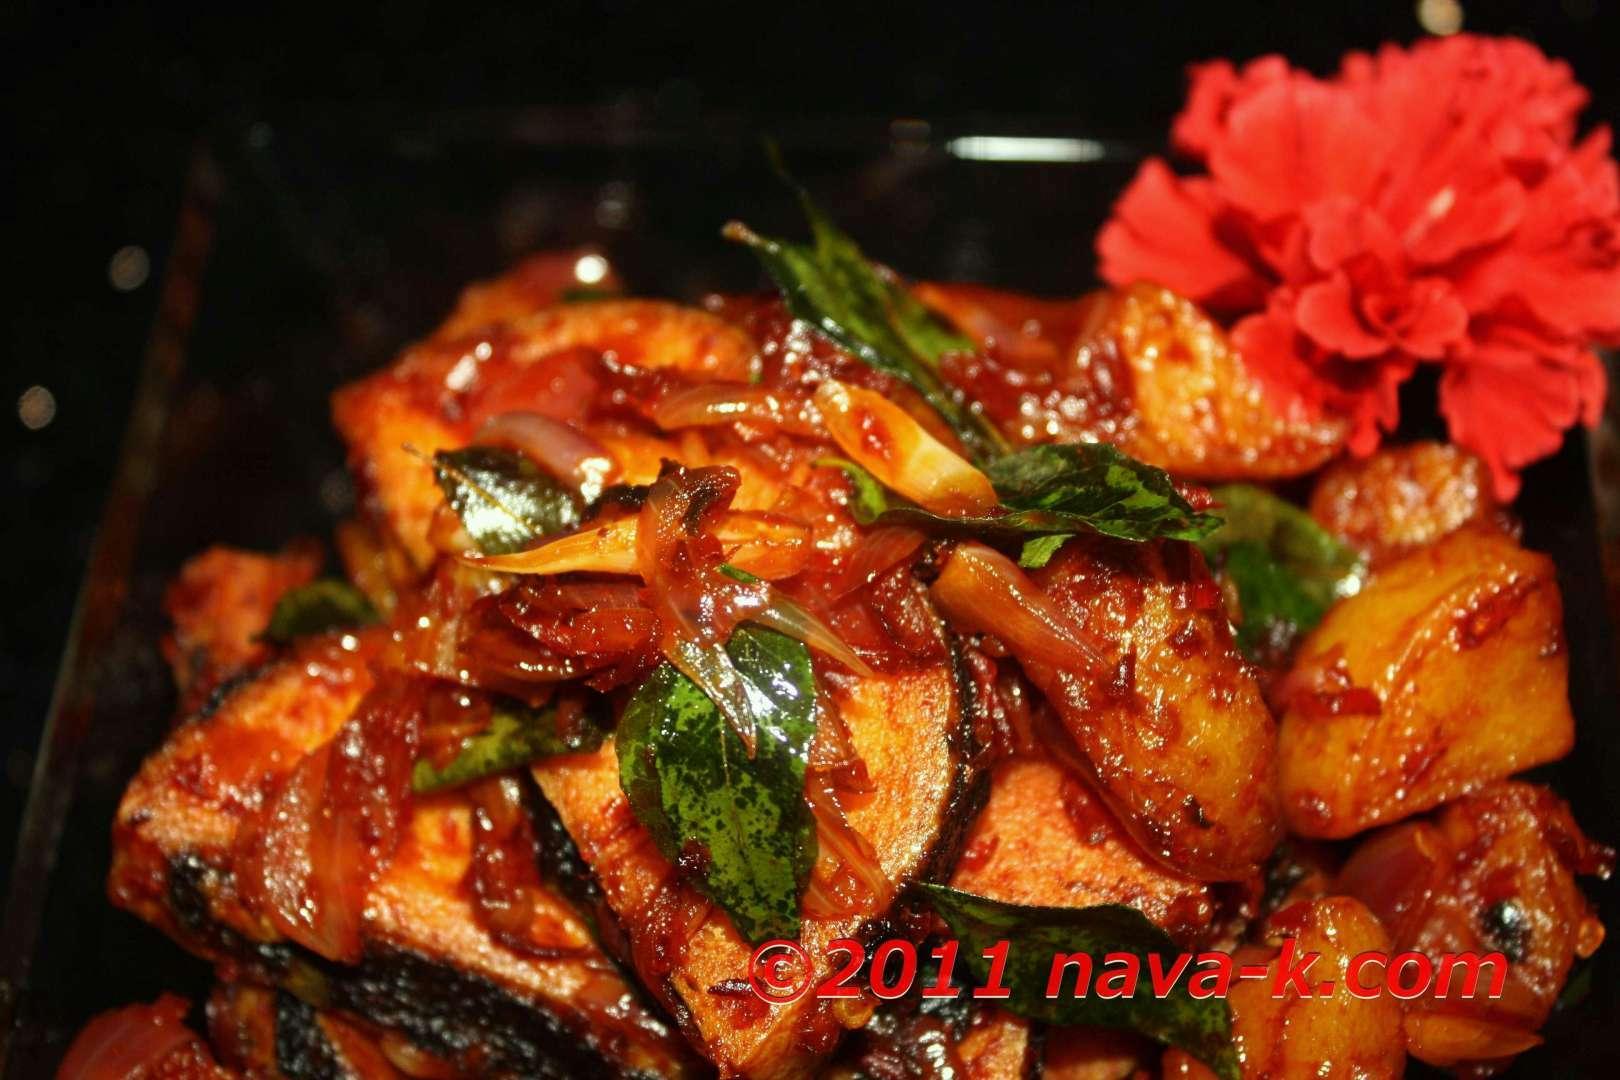 Vegetarian fish and potatoes sambal sauce recipe petitchef for Vegetarian fish sauce